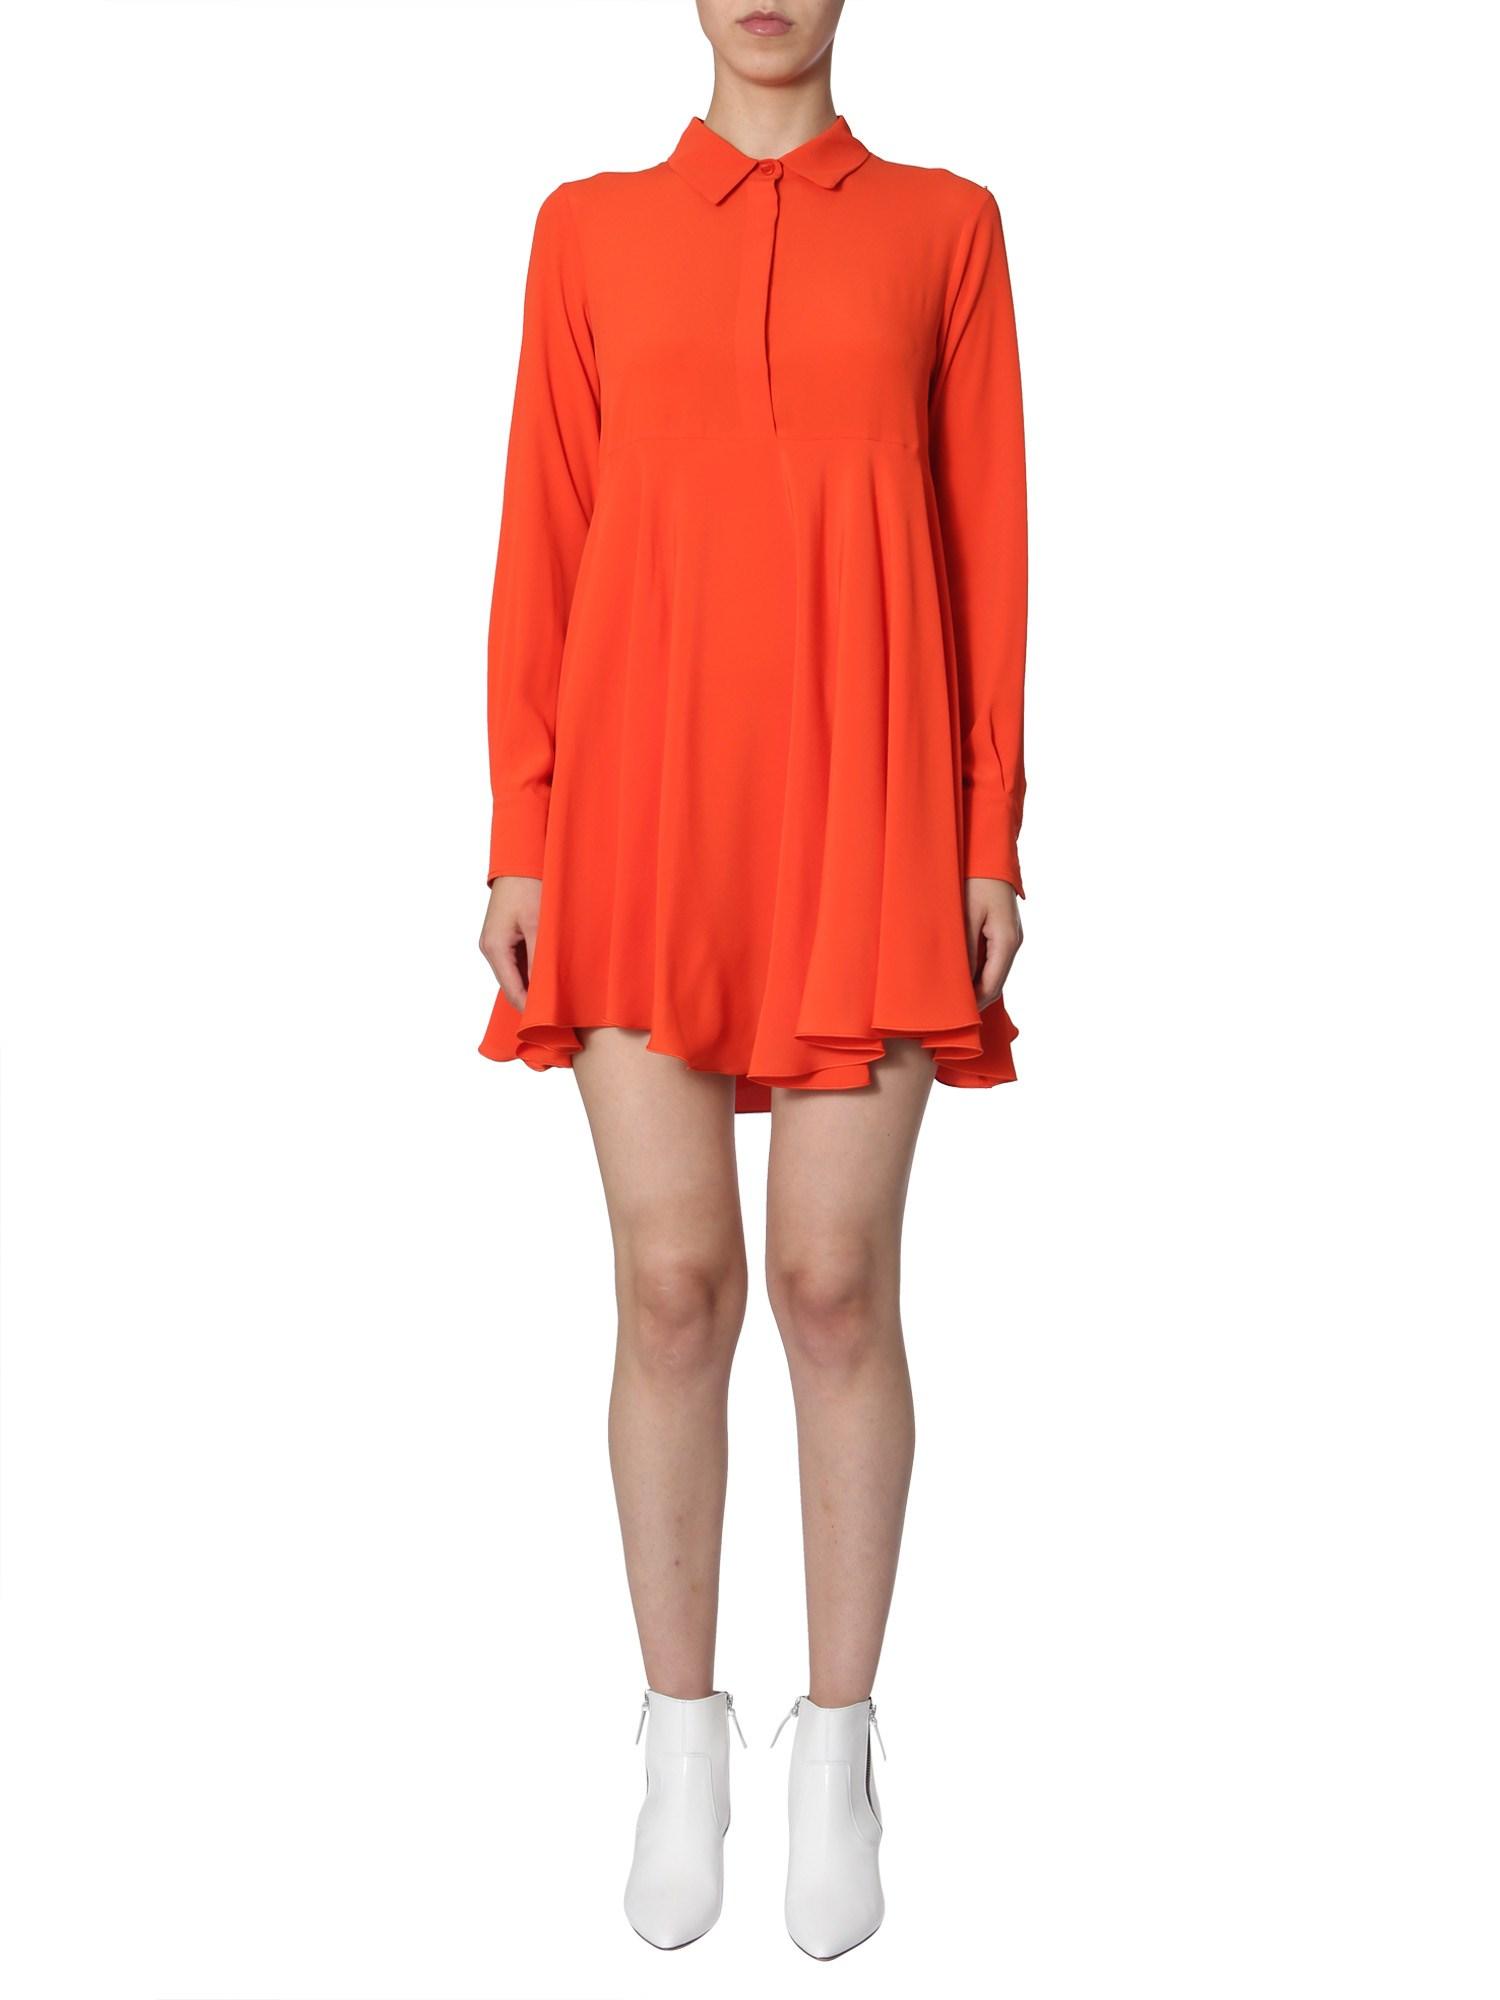 bf993801ccabde Shop Sportmax Code Fashion for Women | ModeSens